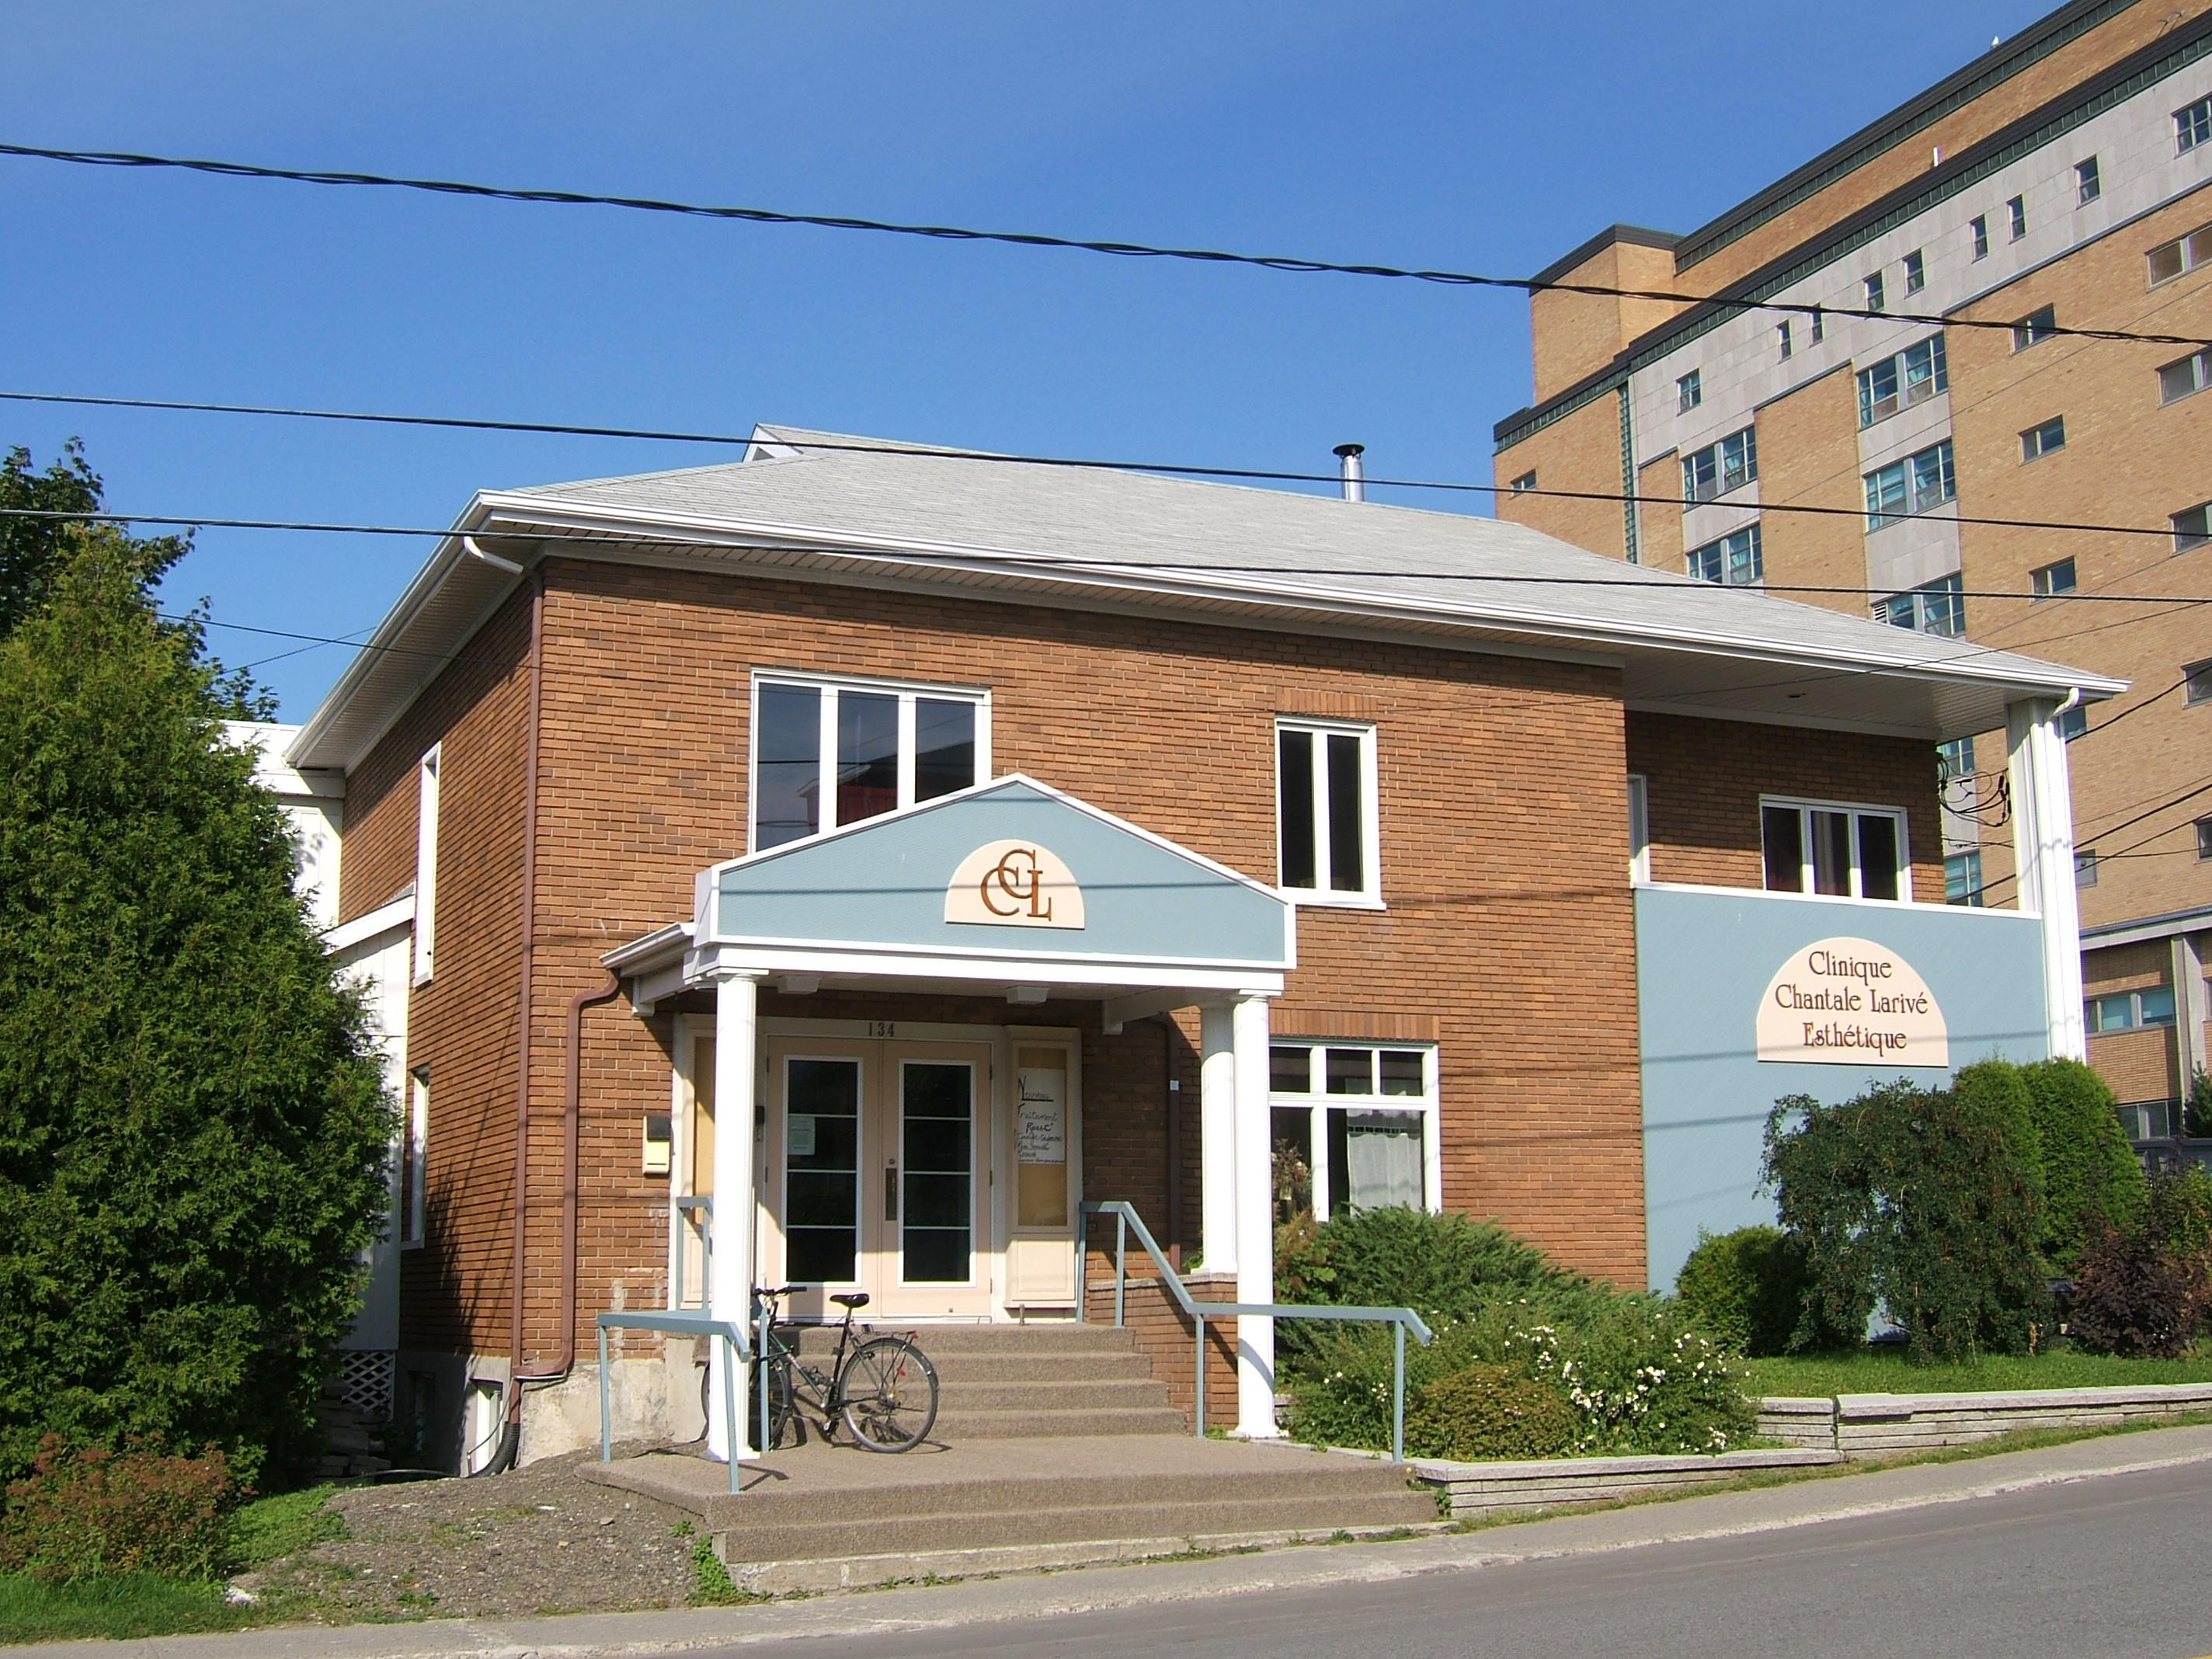 1181 - 134, avenue Rouleau